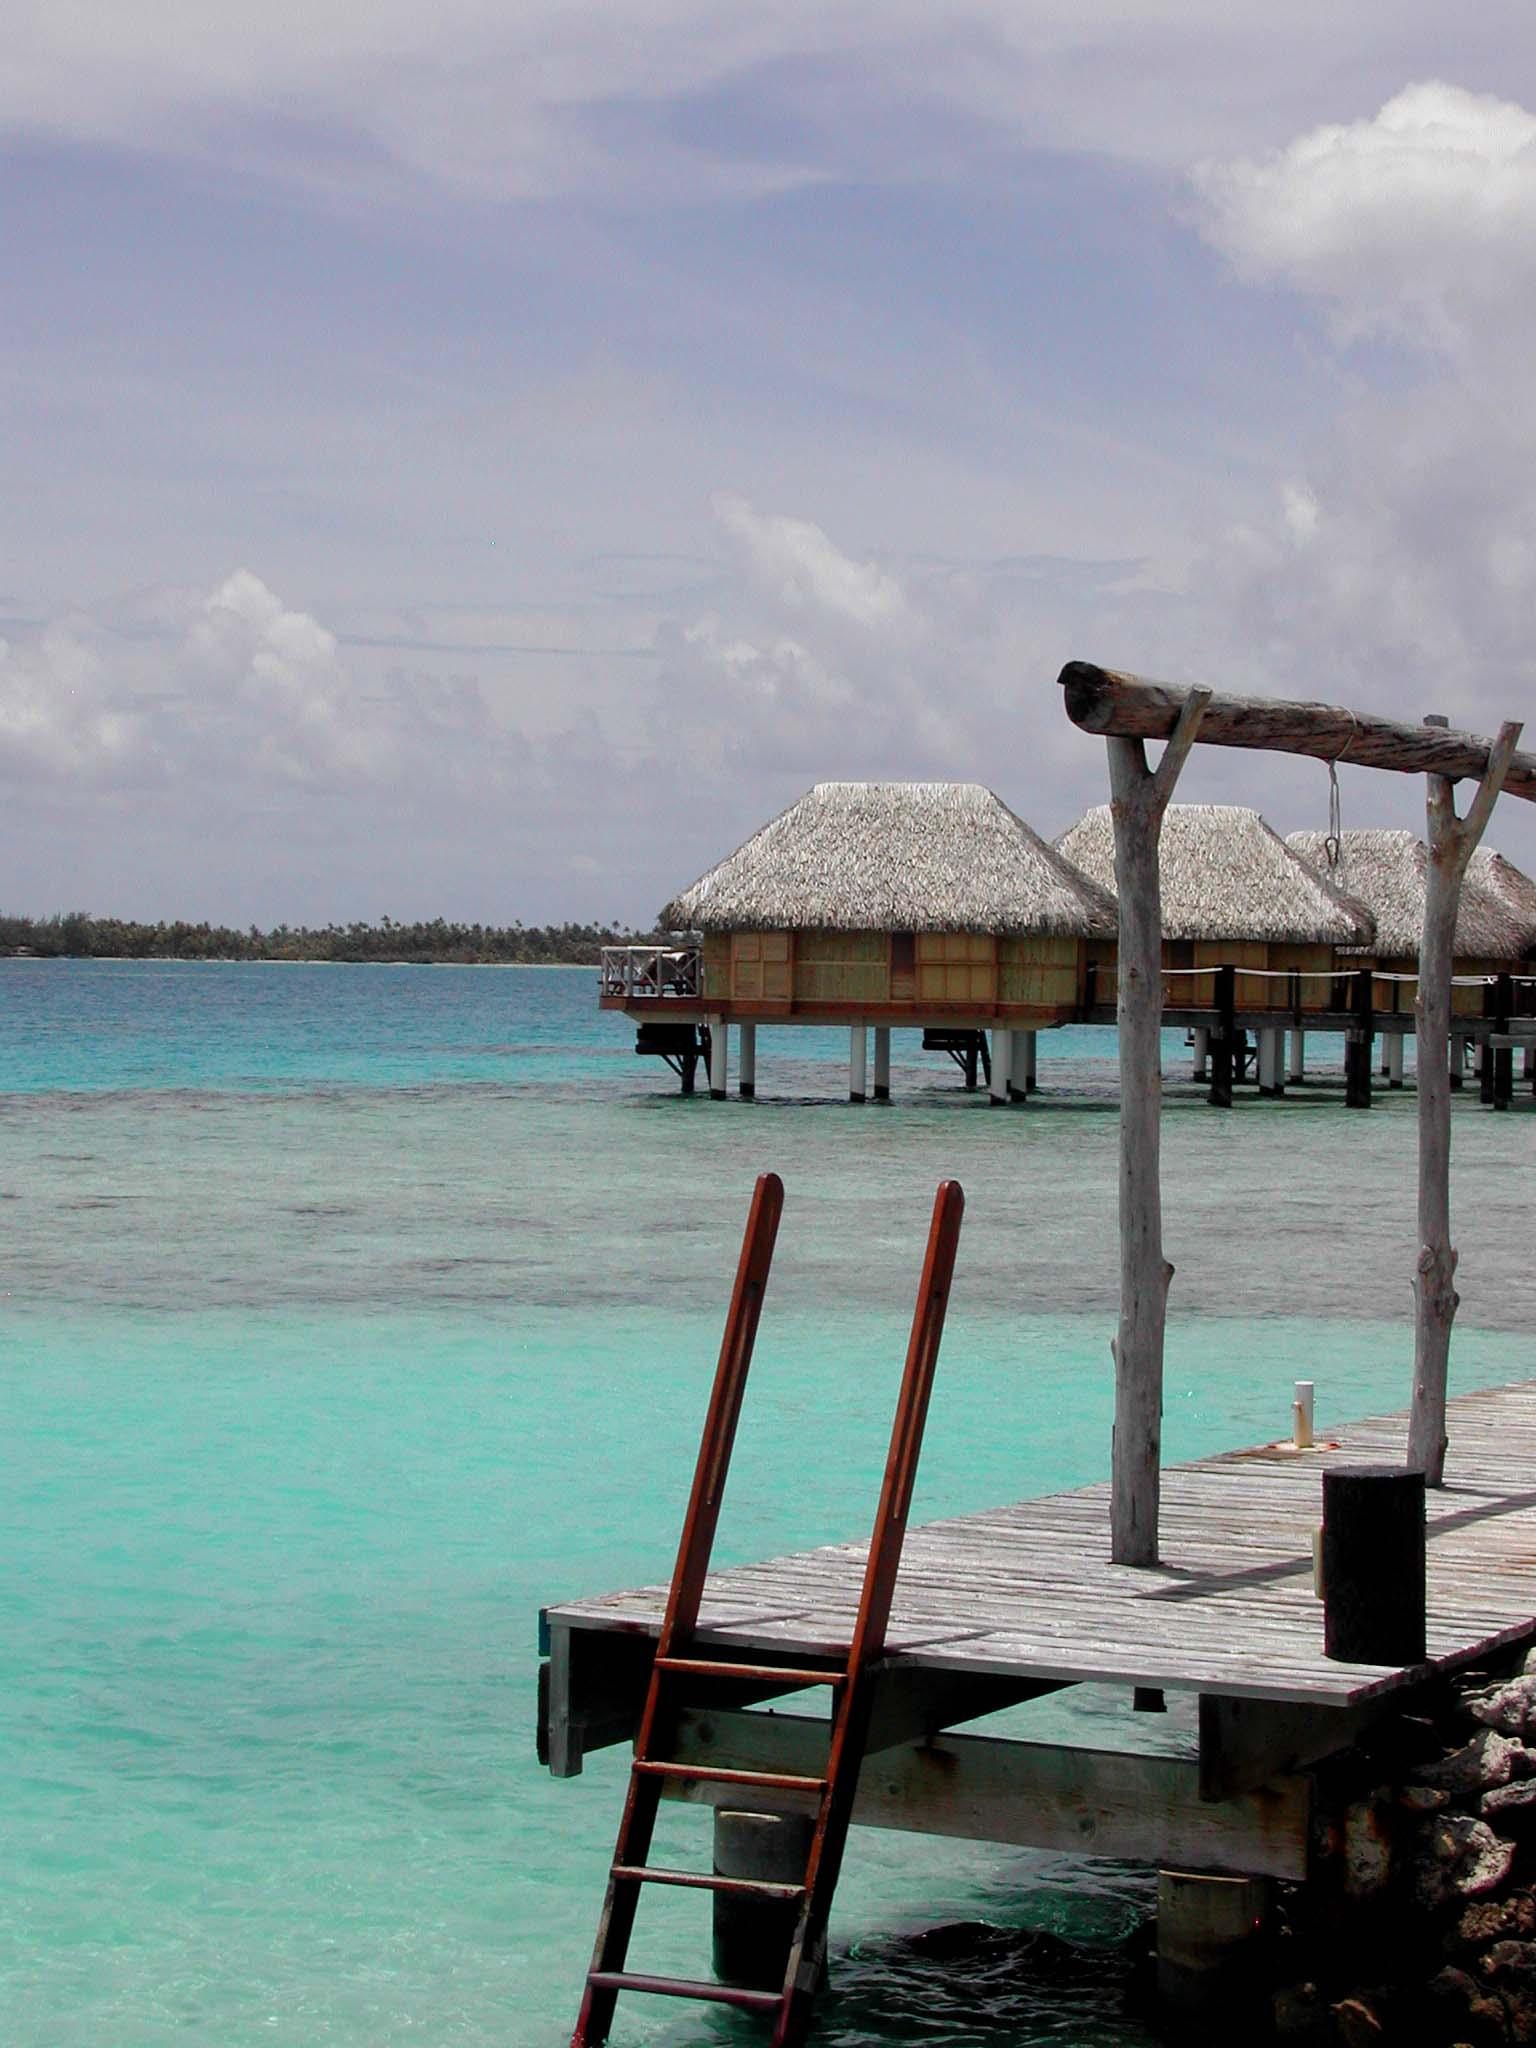 Manihi French Polynesia  city photos gallery : Manihi Pearl Beach Resort French Polynesia Tuamotu Islands Manihi ...